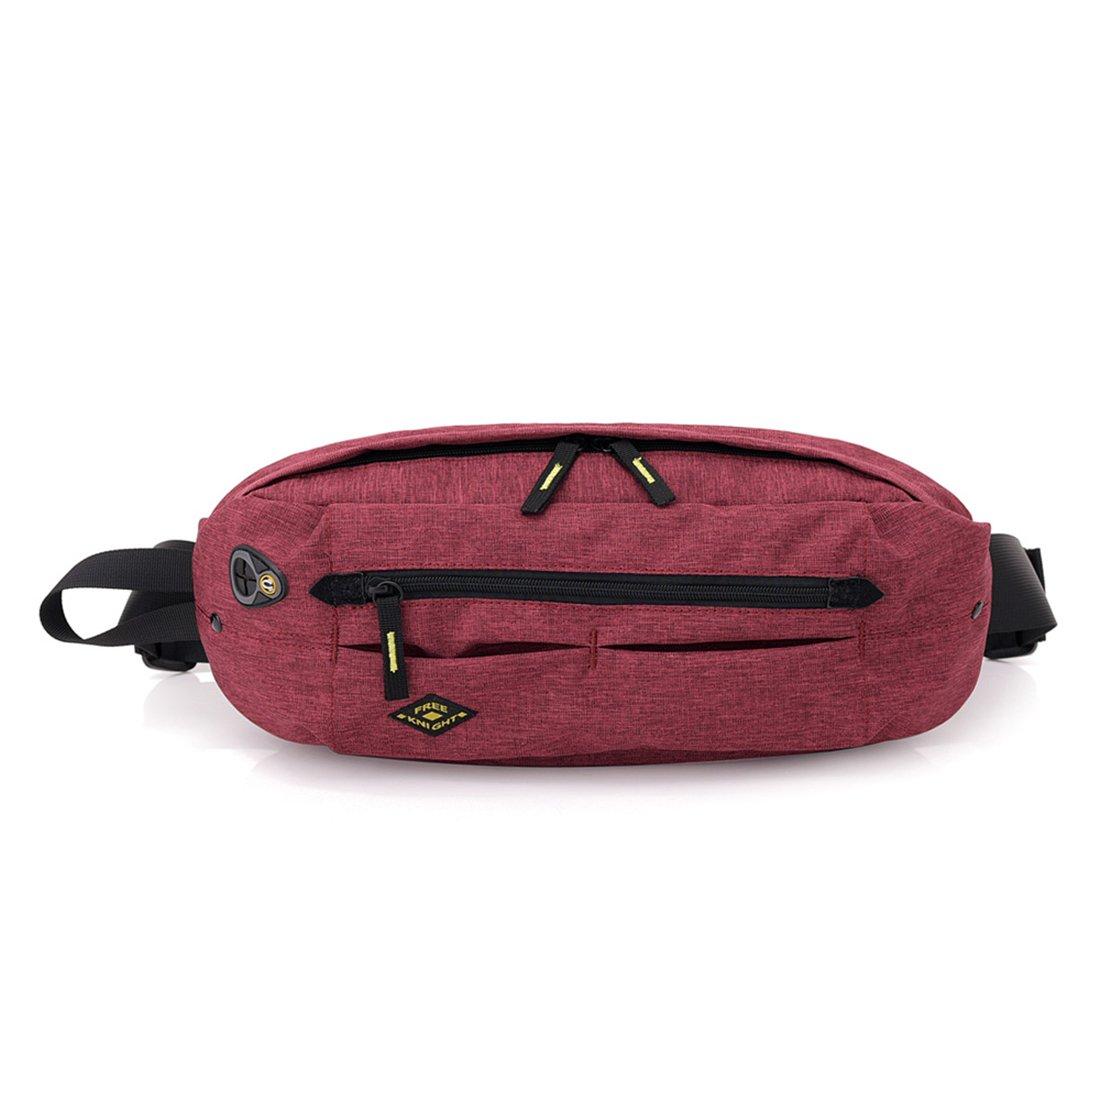 YICHUN Fanny Pack Waist Bag Fanny Bag Sport Bag Shoulder Bag Outdoors Bag Running Climbing Pack